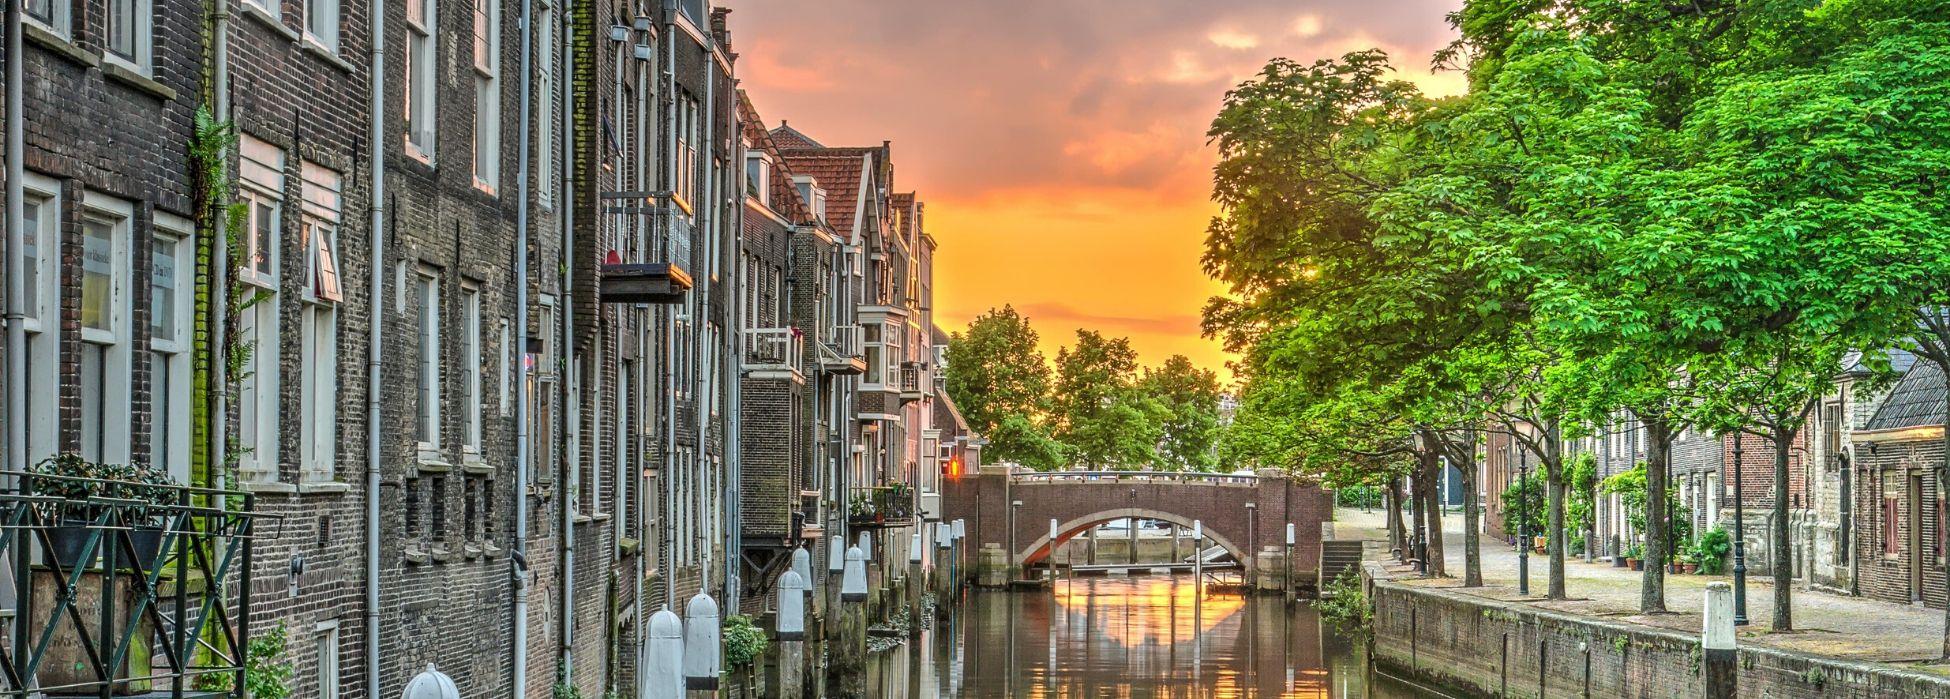 Dordrecht Hydrorock project